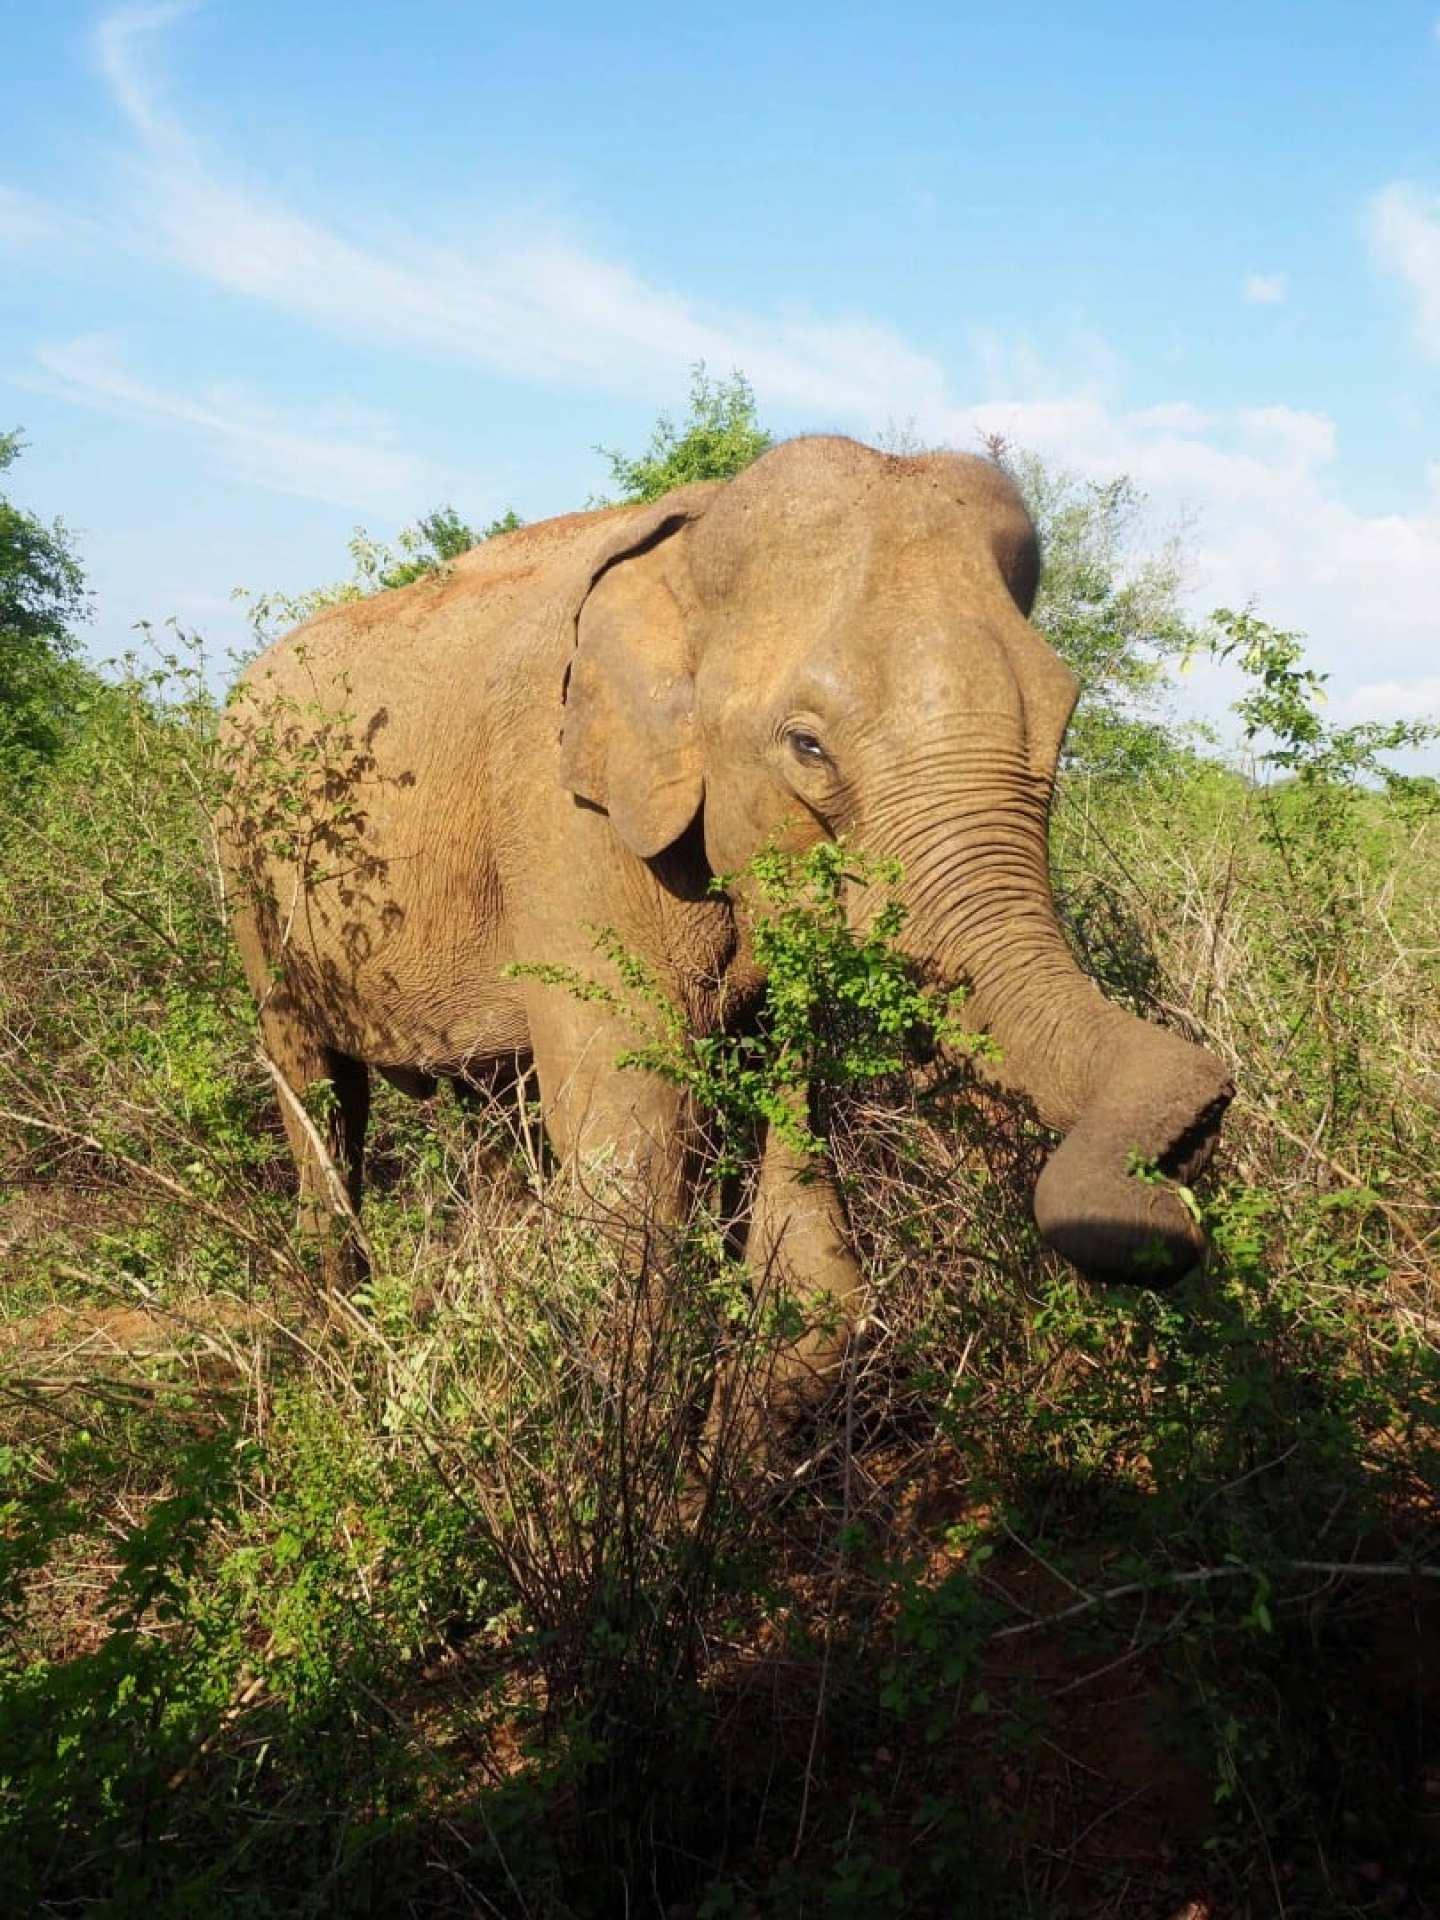 http://thirdeyetraveller.com/kottawatta-village-udawalawe-review/